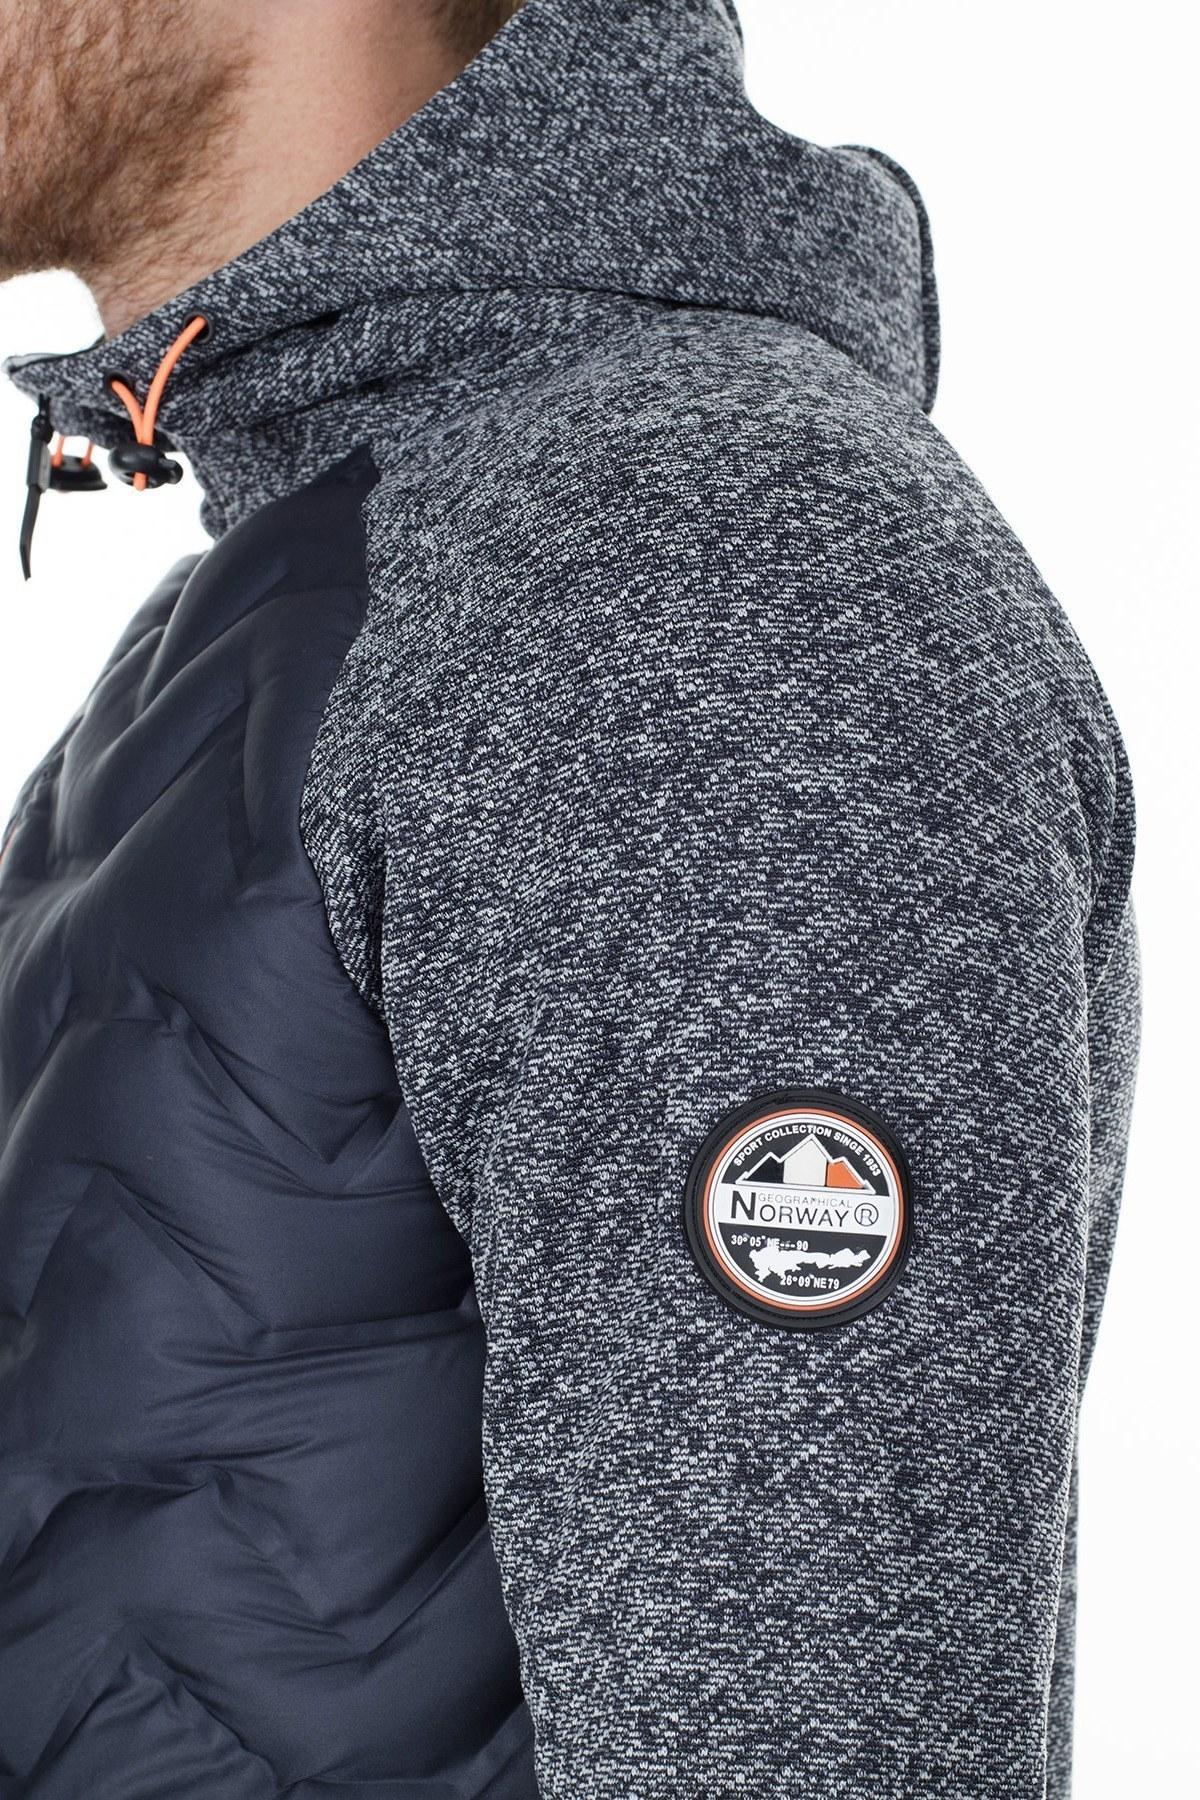 Norway Geographical Outdoor Erkek Sweat GLOBE LACİVERT-LACİVERT